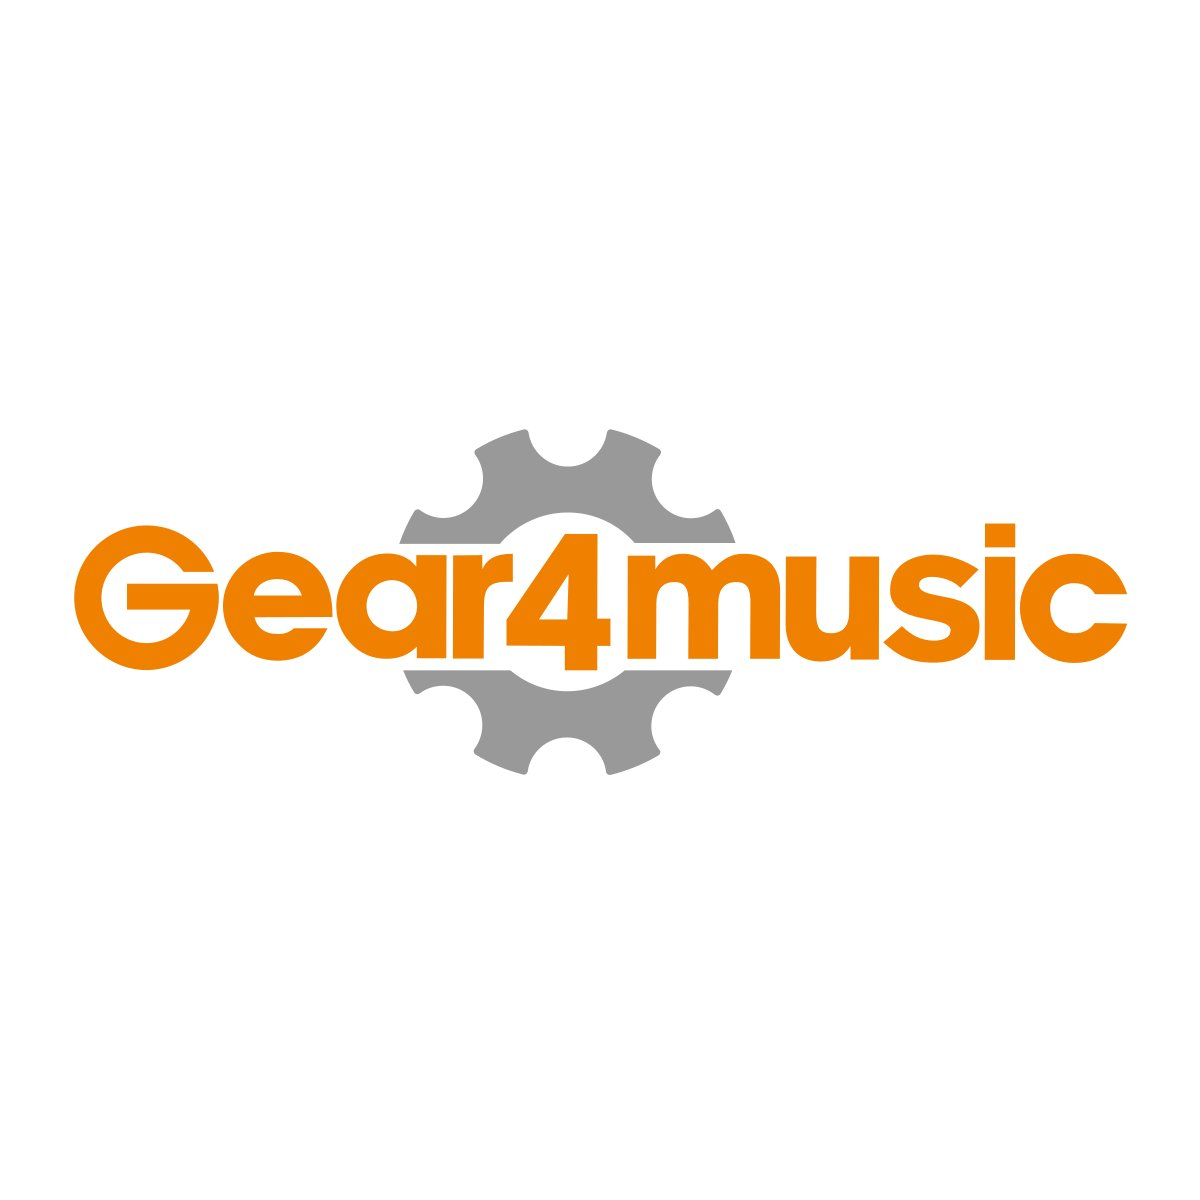 Deluxe klassisk elektro-akustisk Guitar fra Gear4music + Forstærker pakke